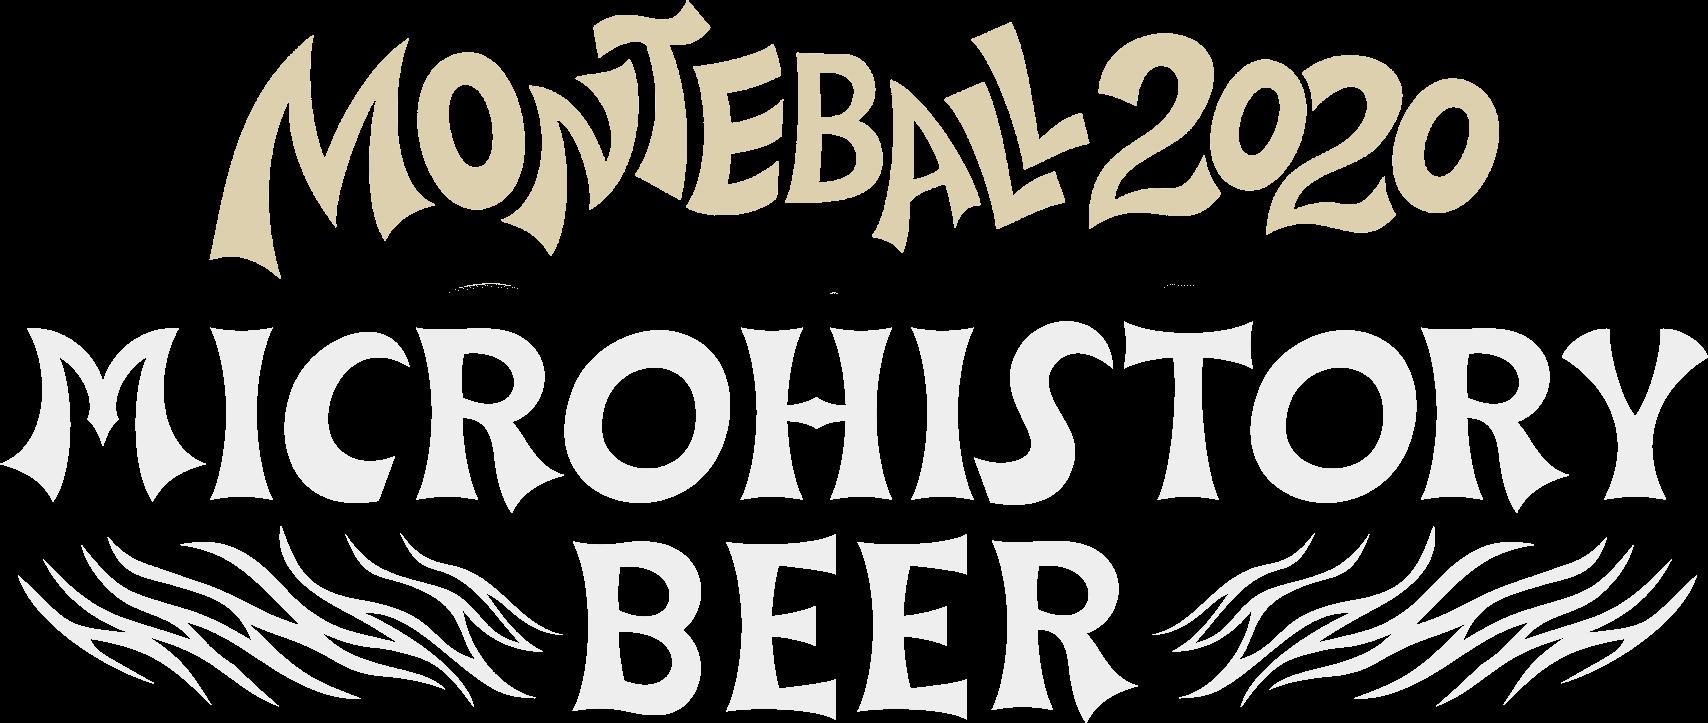 monteball-2020-logo-microhistorybeer.com